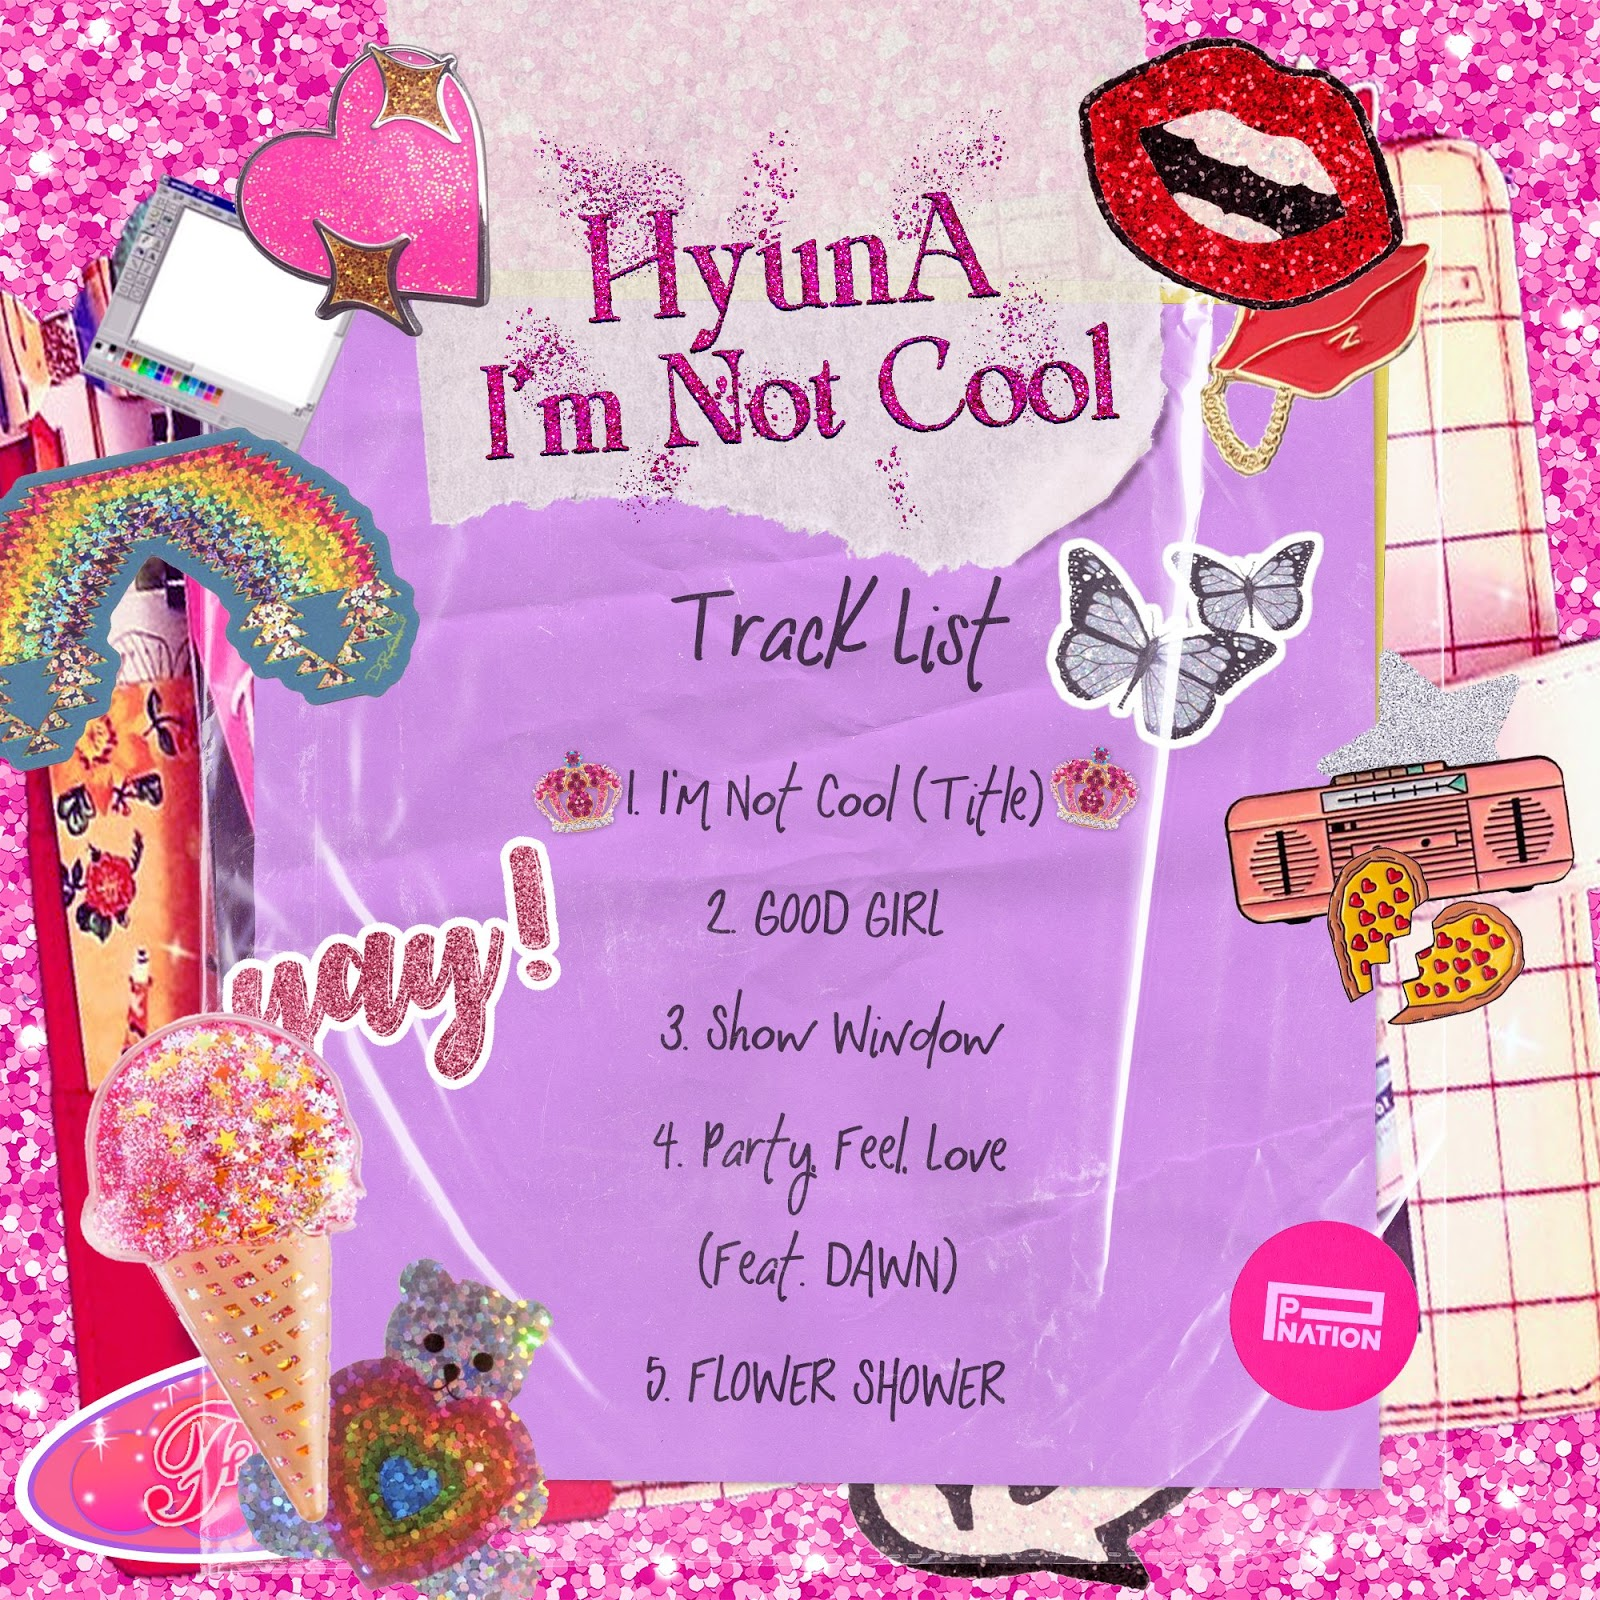 hyuna im not cool tracklist comeback